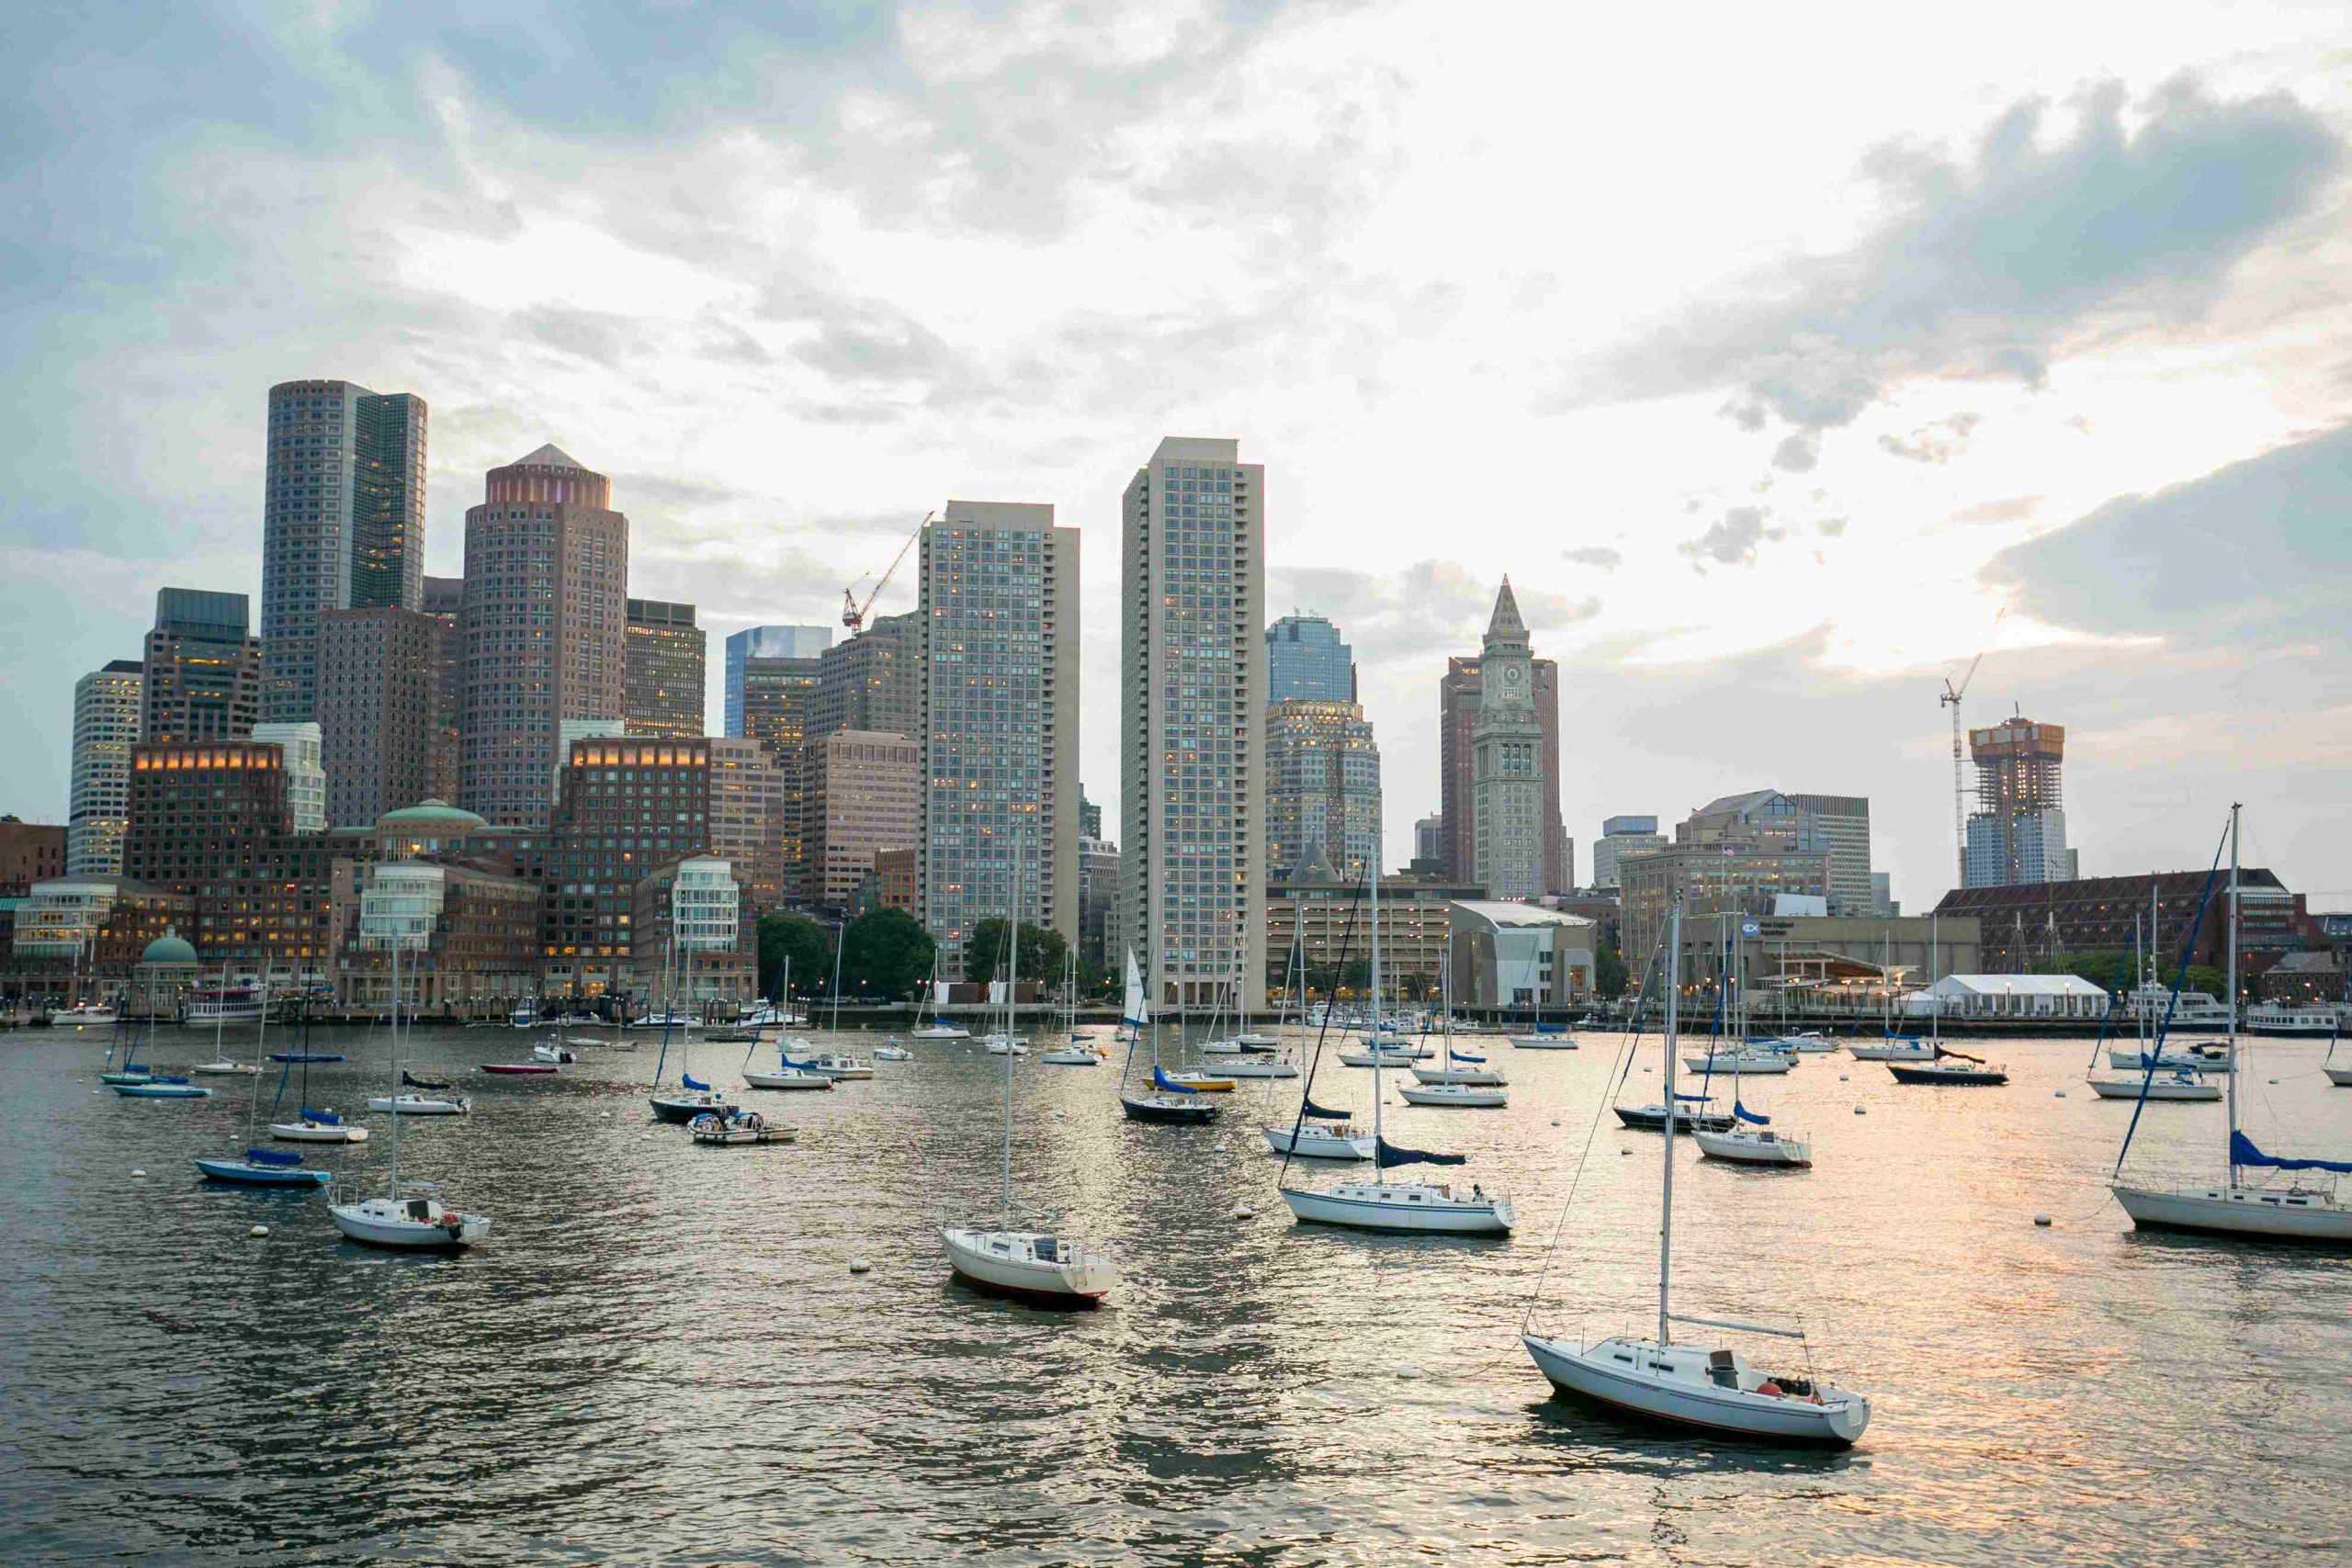 Boston skyline with docked boats